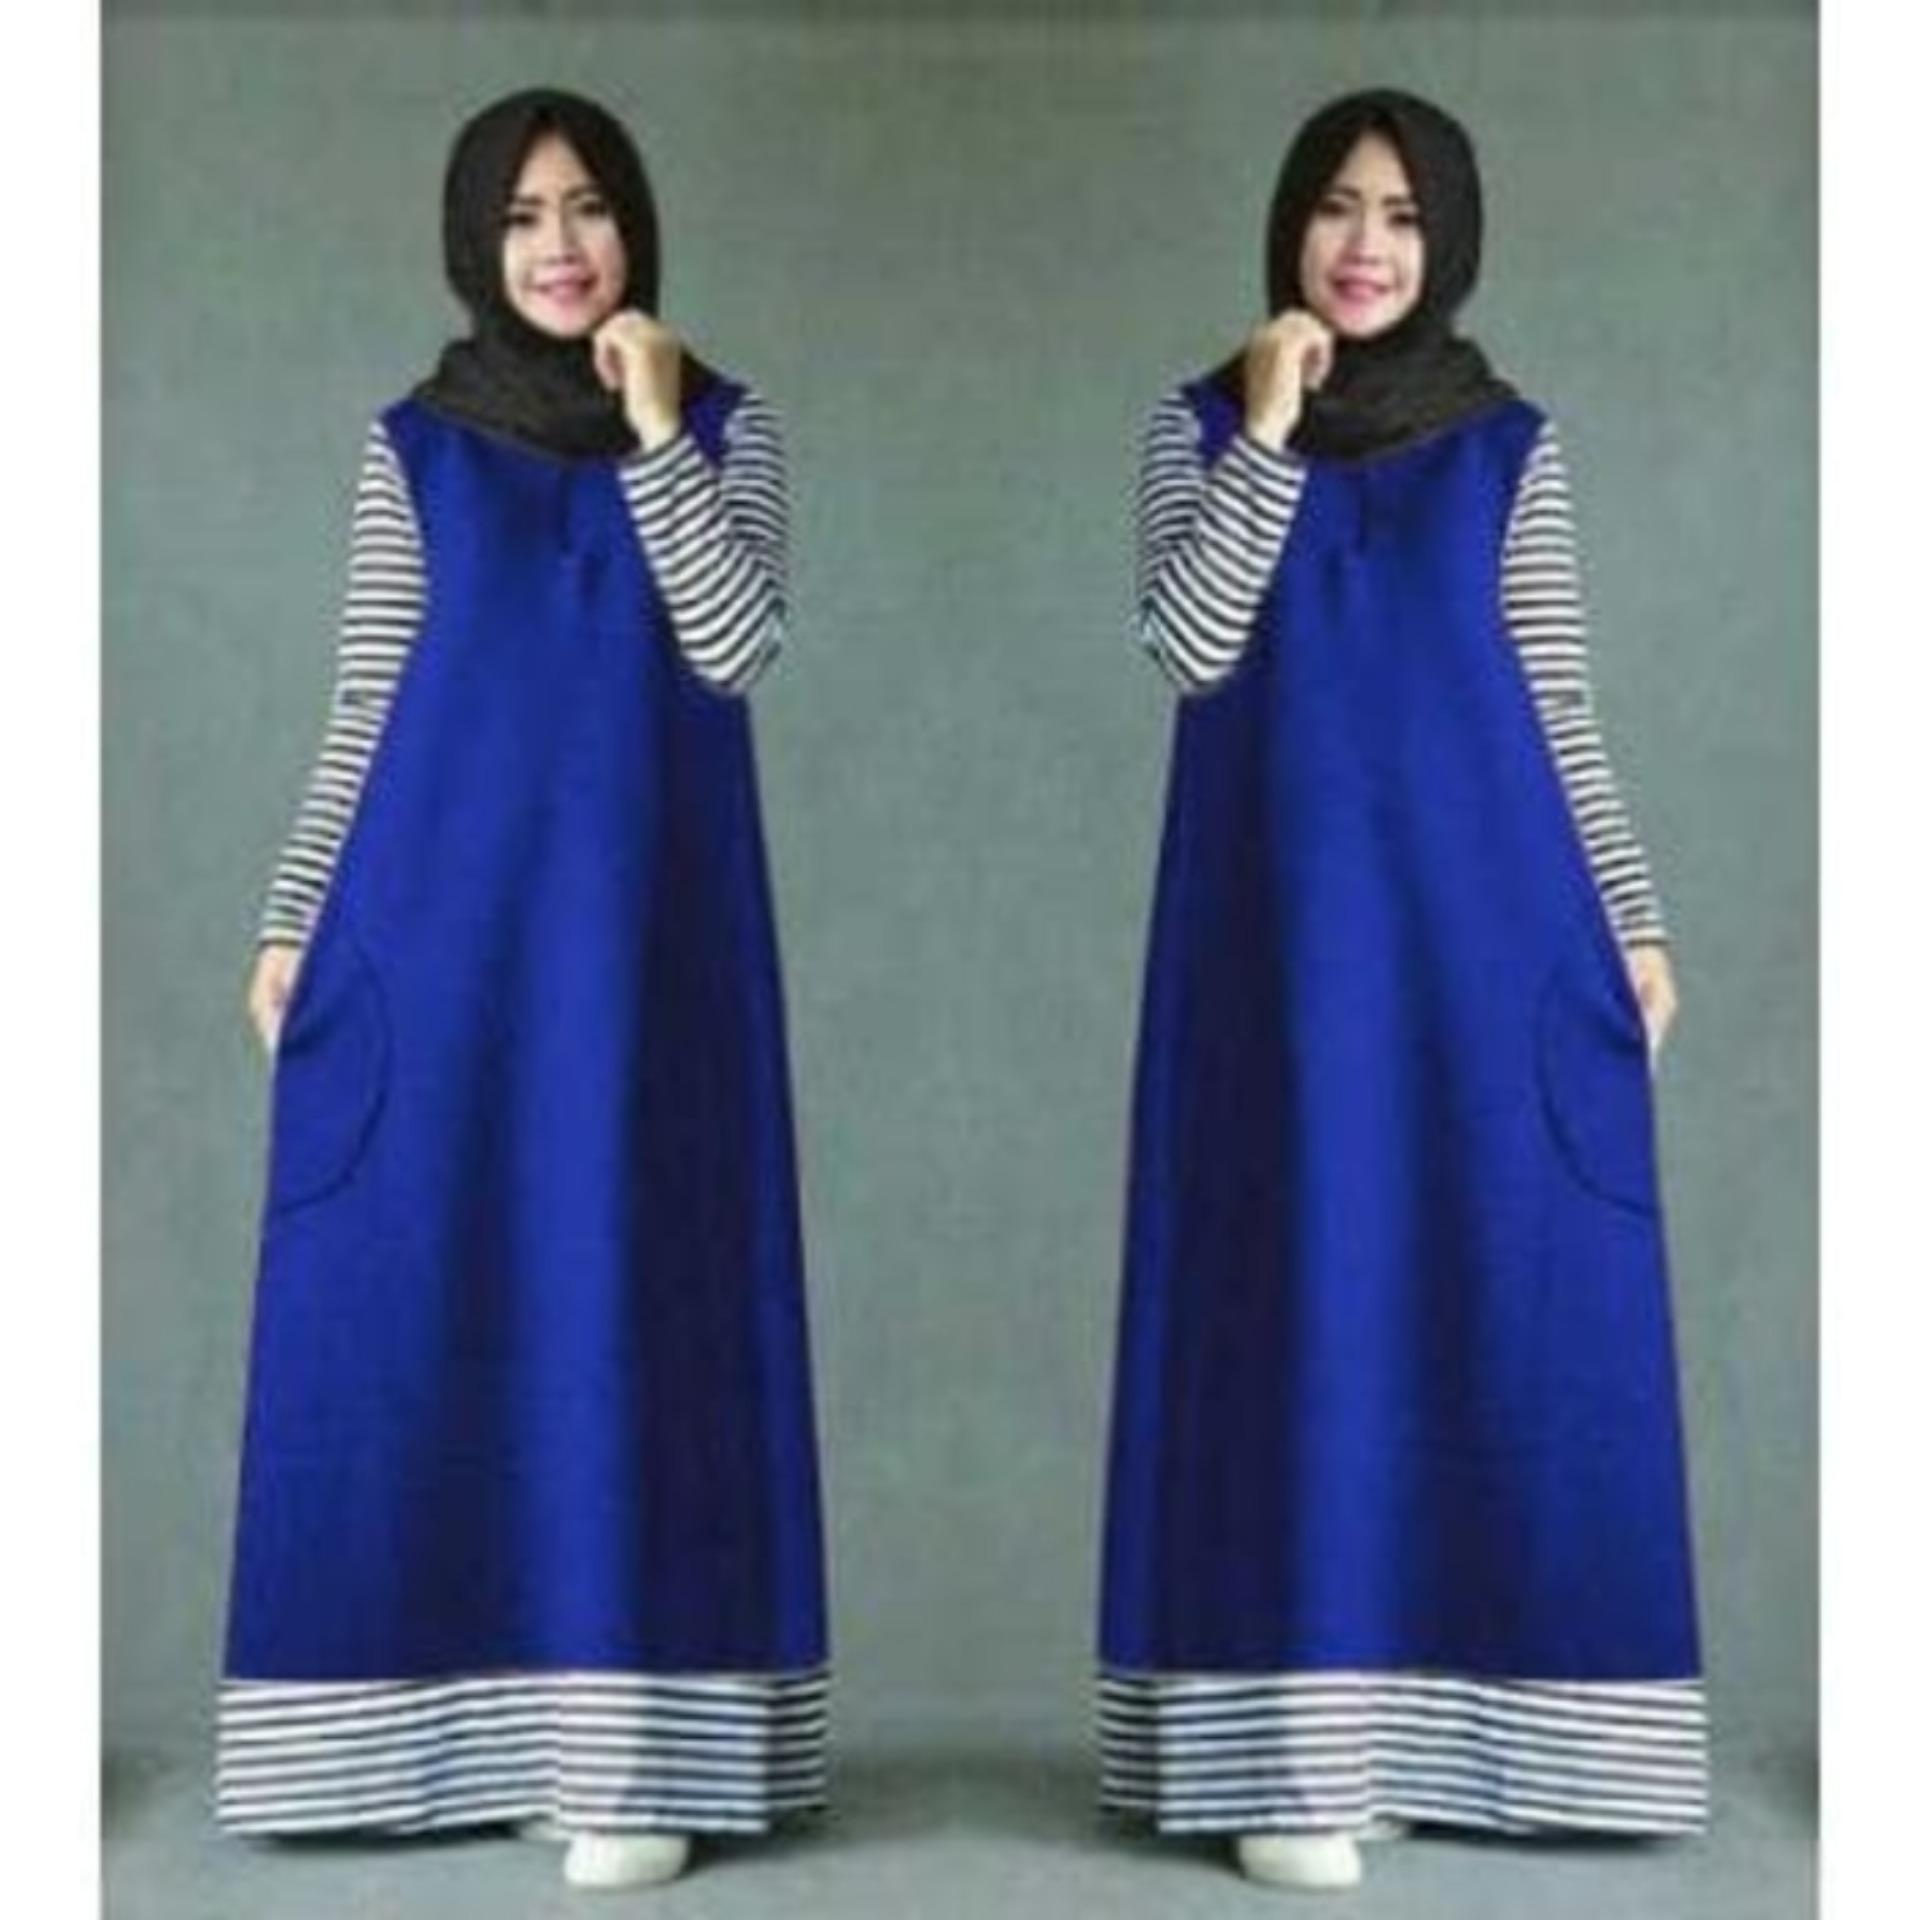 Perbandingan Harga Baju Gamis Ameera Biru Baju Dress Maxi Muslim